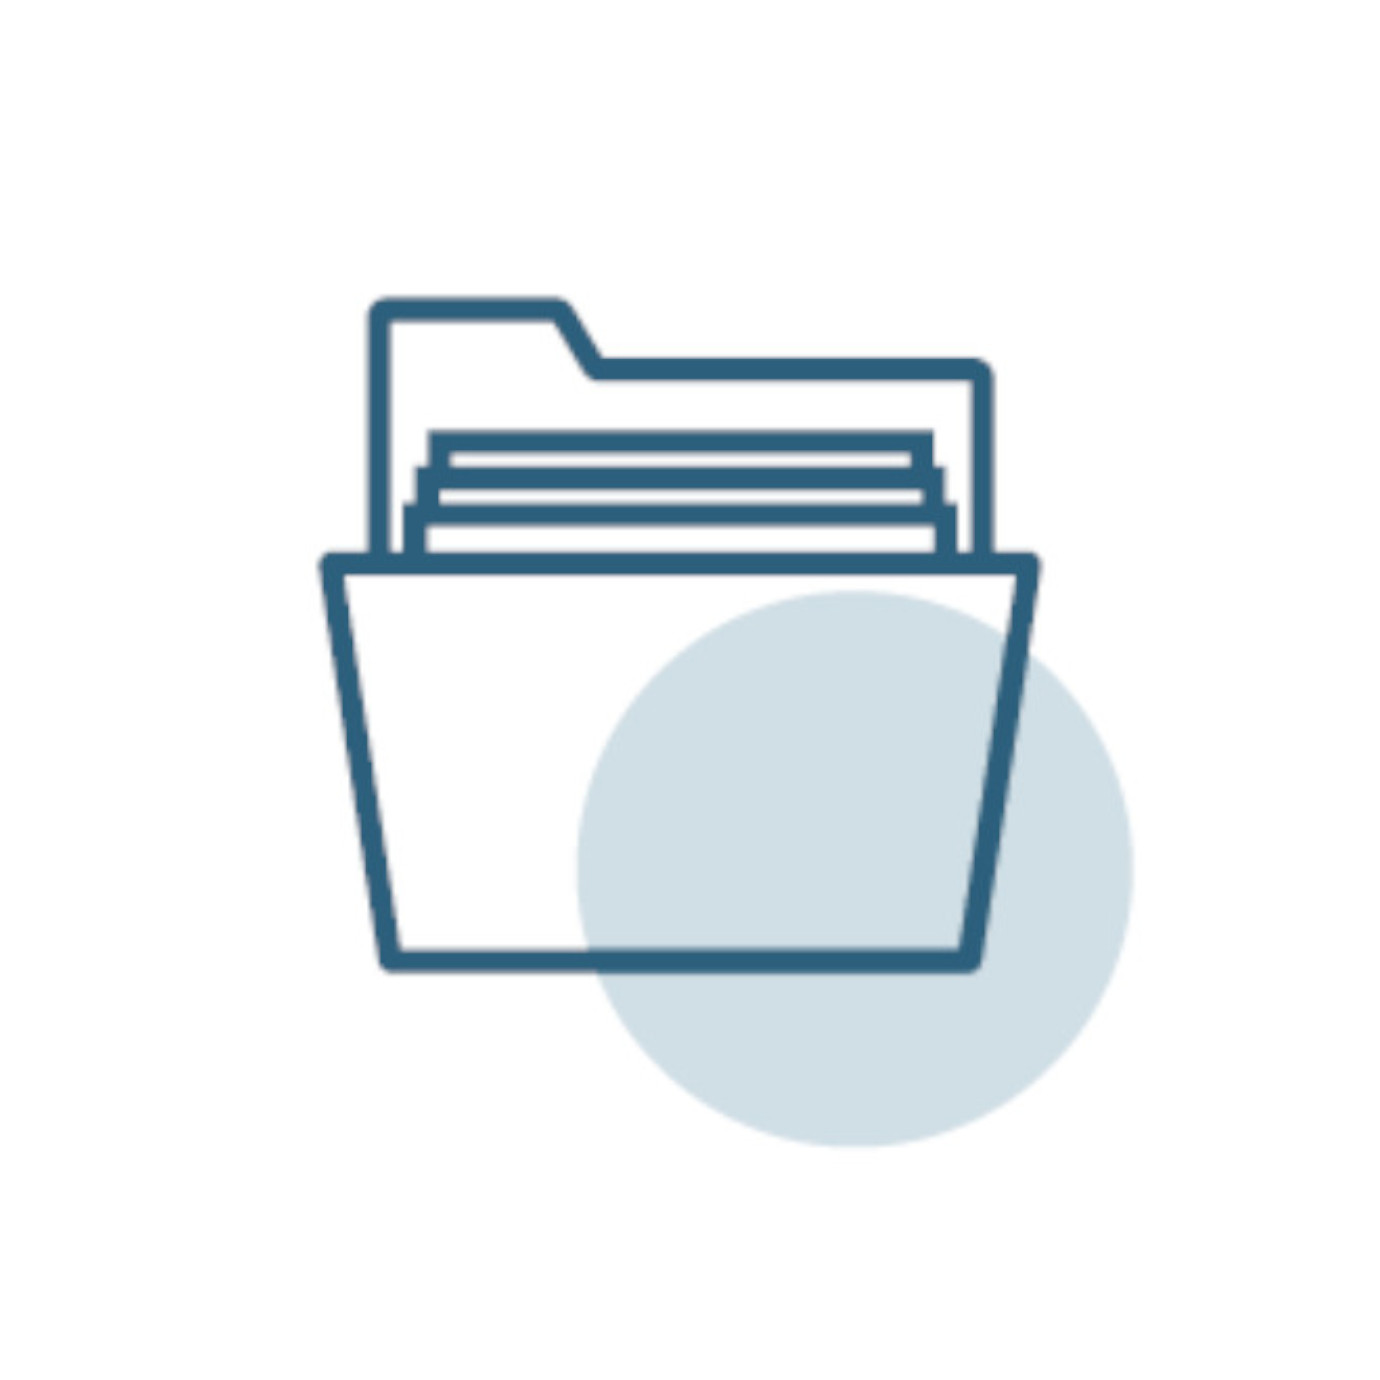 SmartIT-Daten-Informationen